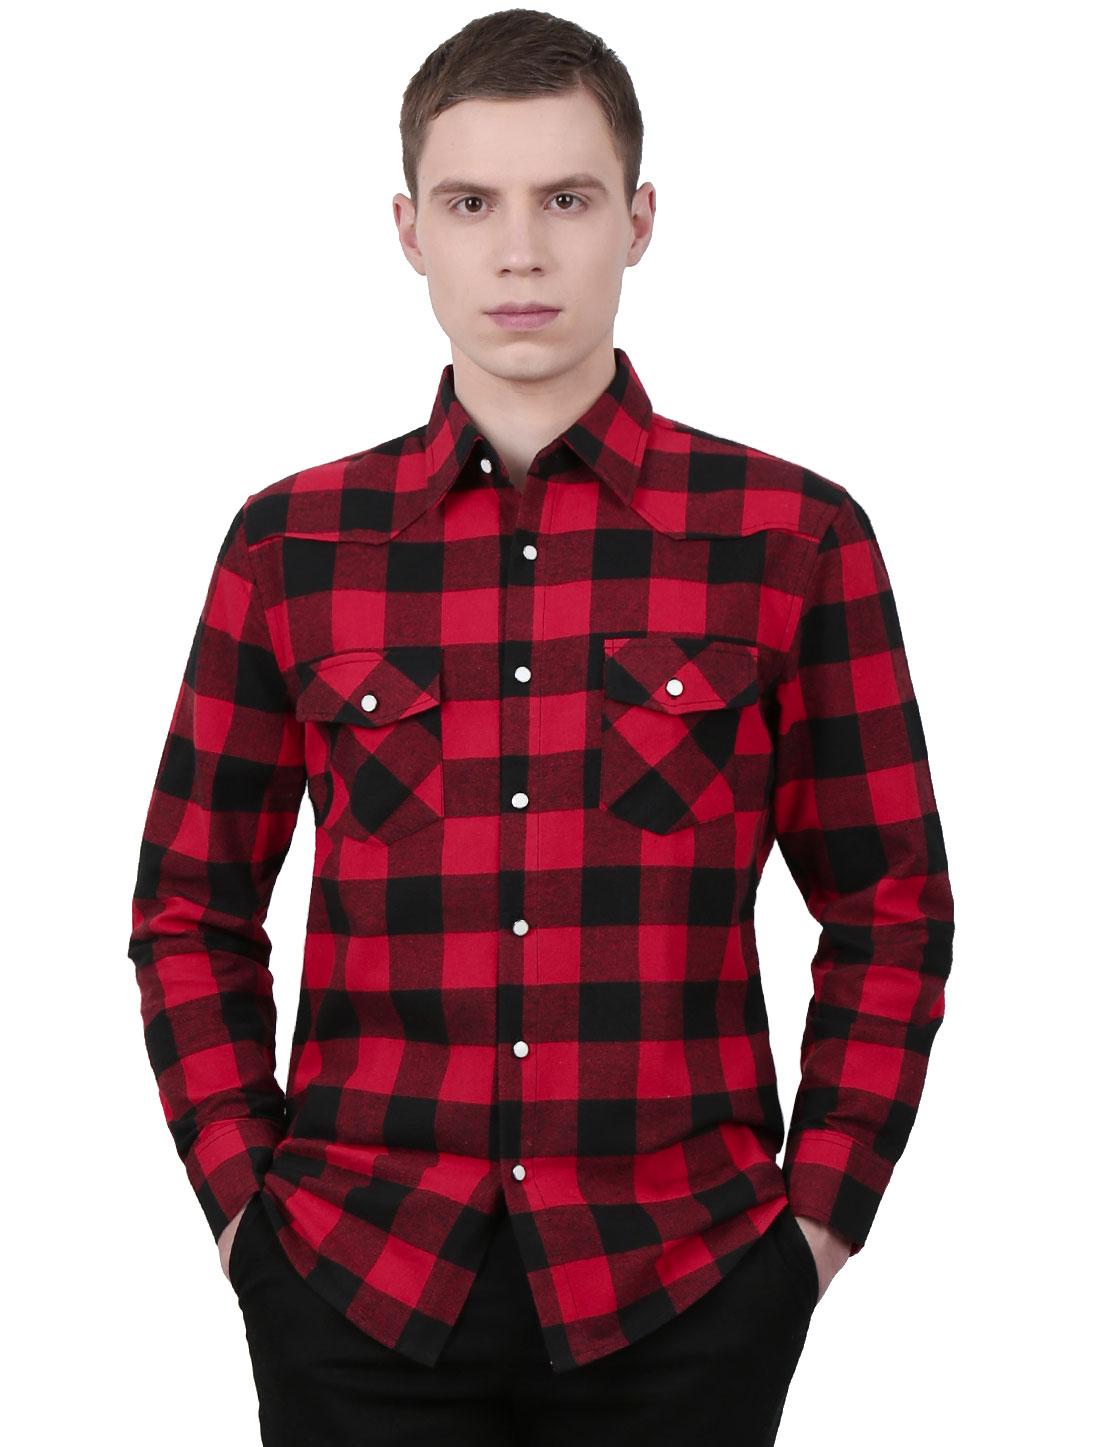 Men Long Sleeve Chest Pockets Button Down Slim Fit Shirt Red Black M